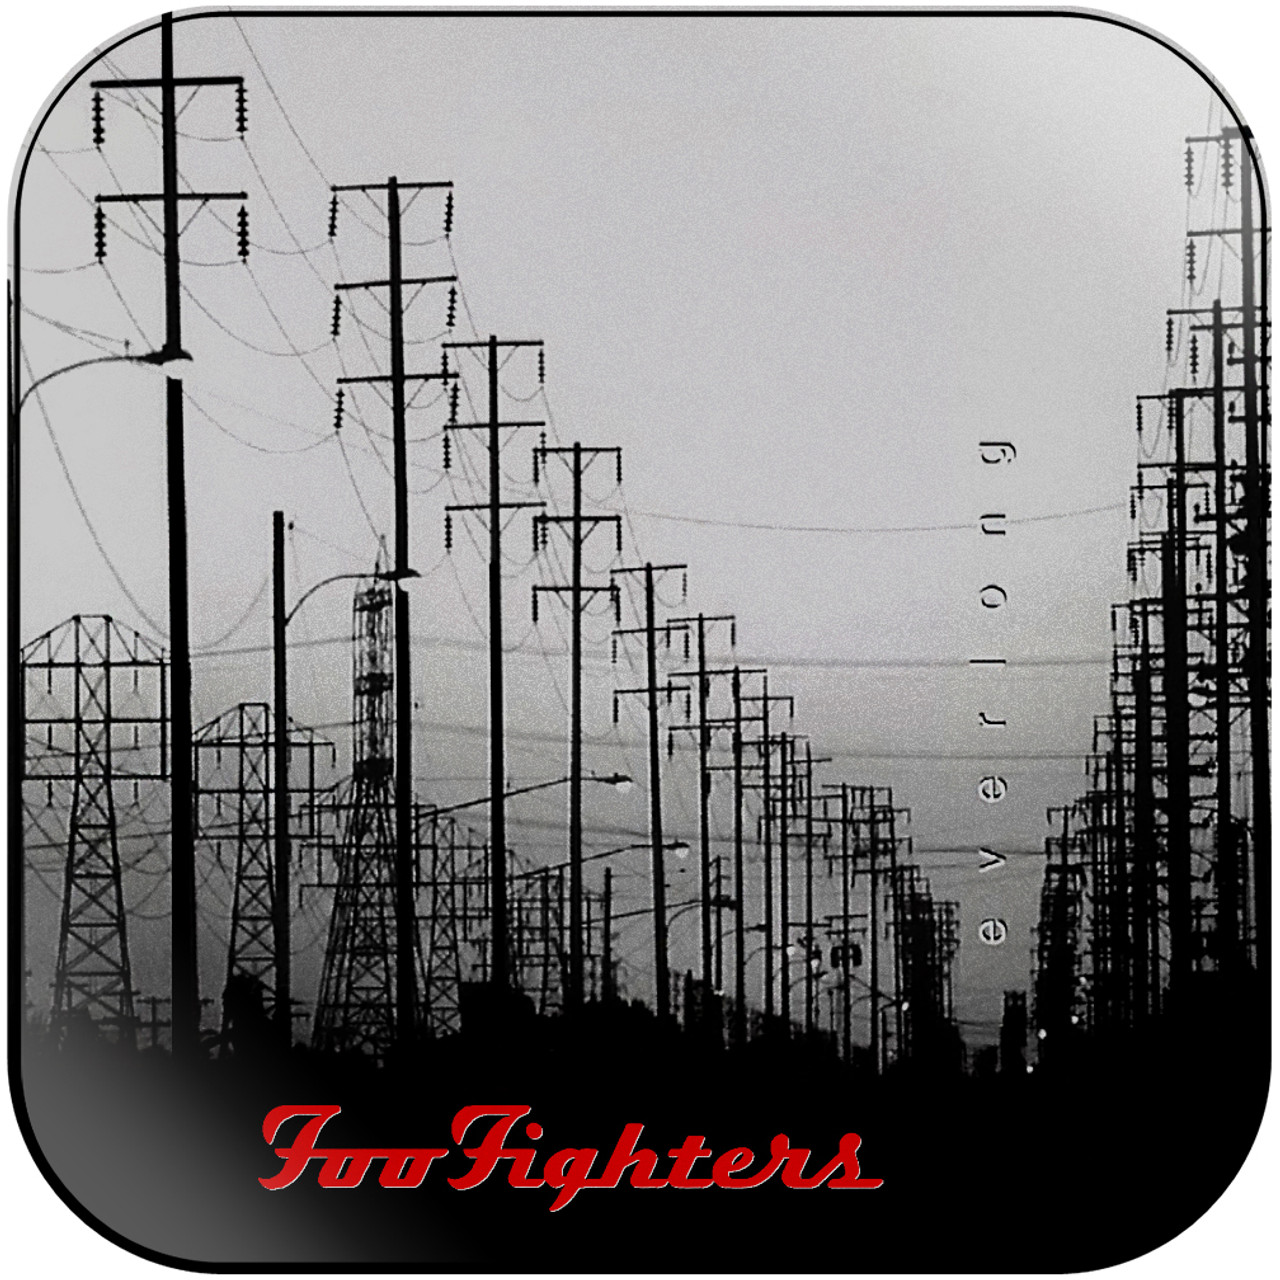 Foo Fighters Everlong 3 Album Cover Sticker